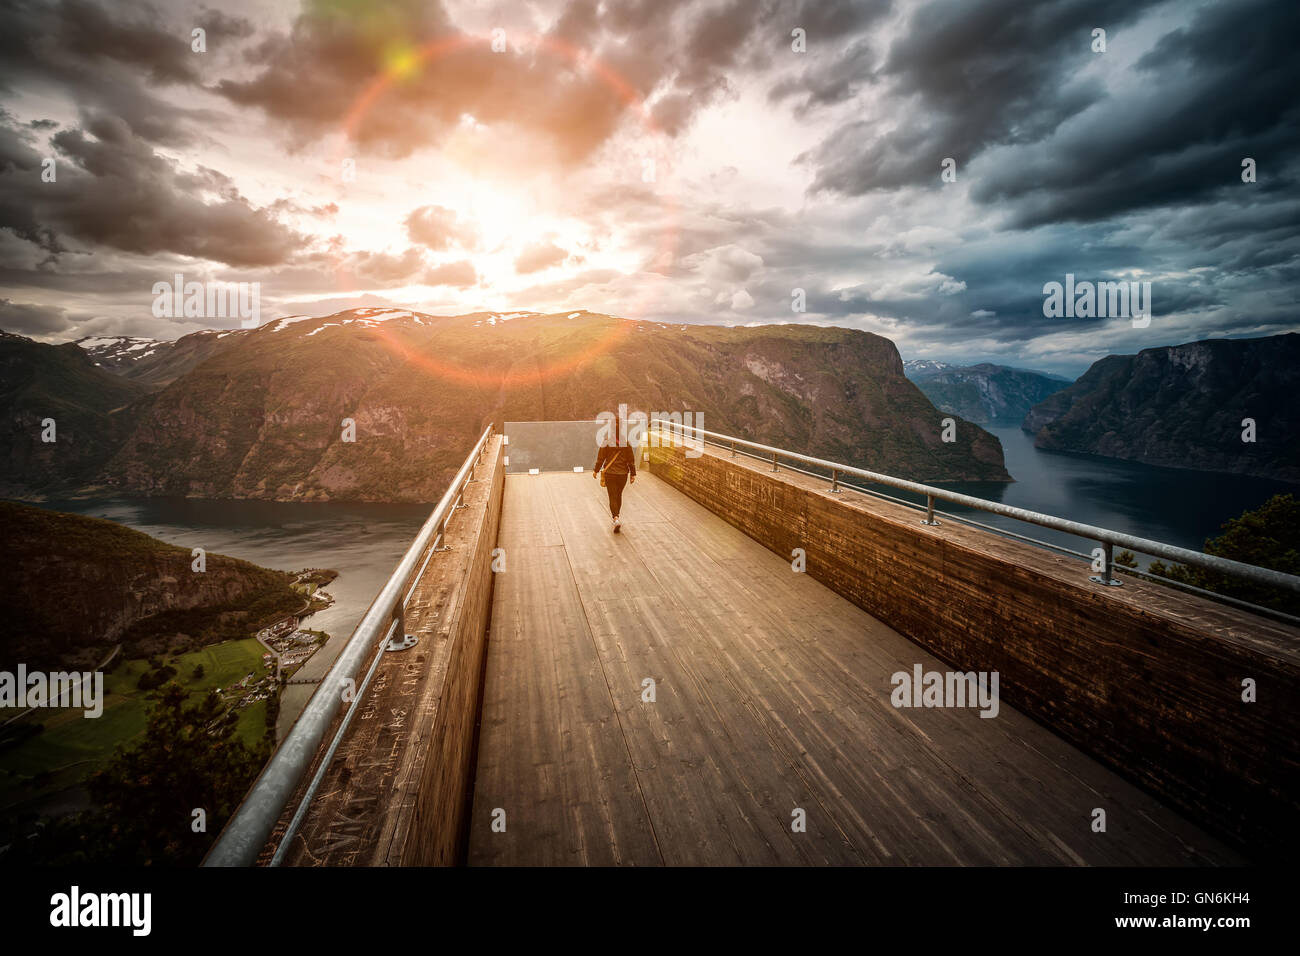 Mirador Stegastein observation deck punto de vista hermosa naturaleza noruega. Imagen De Stock